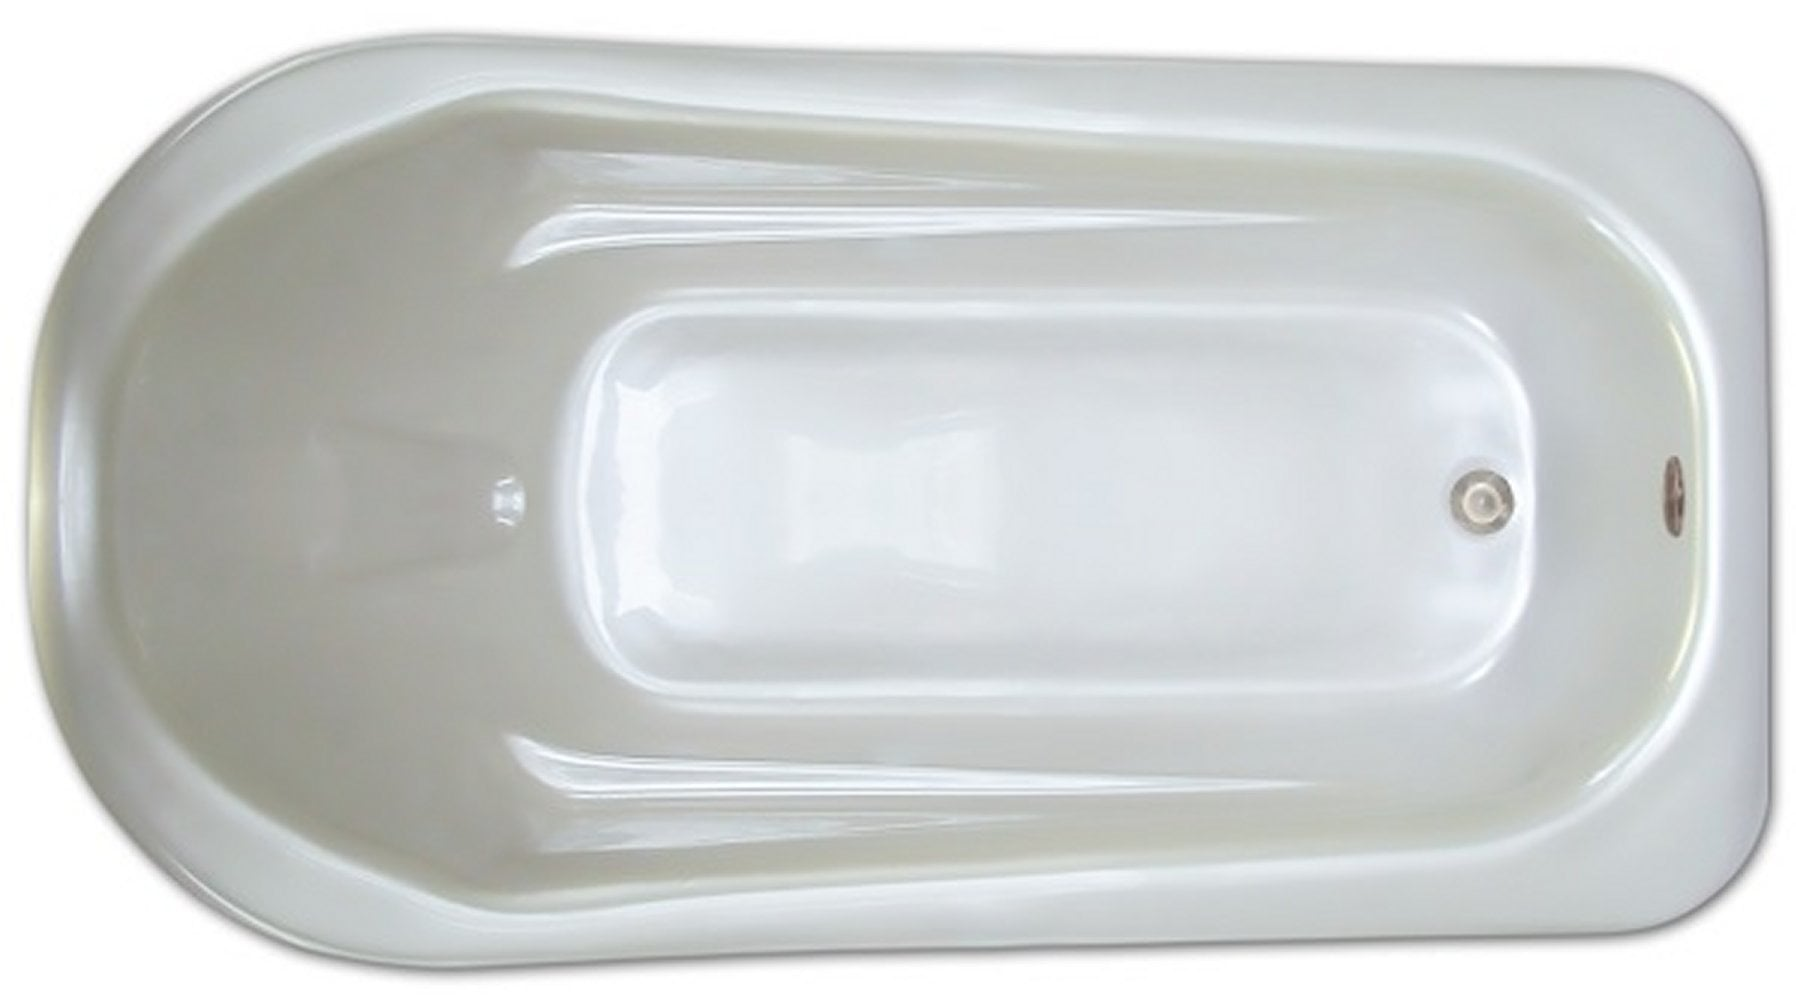 Drop-in Bathtub / 72x36x18 / high gloss white acrylic / Rectangle / LPI279-S Pinnacle Bath - Soaker 0